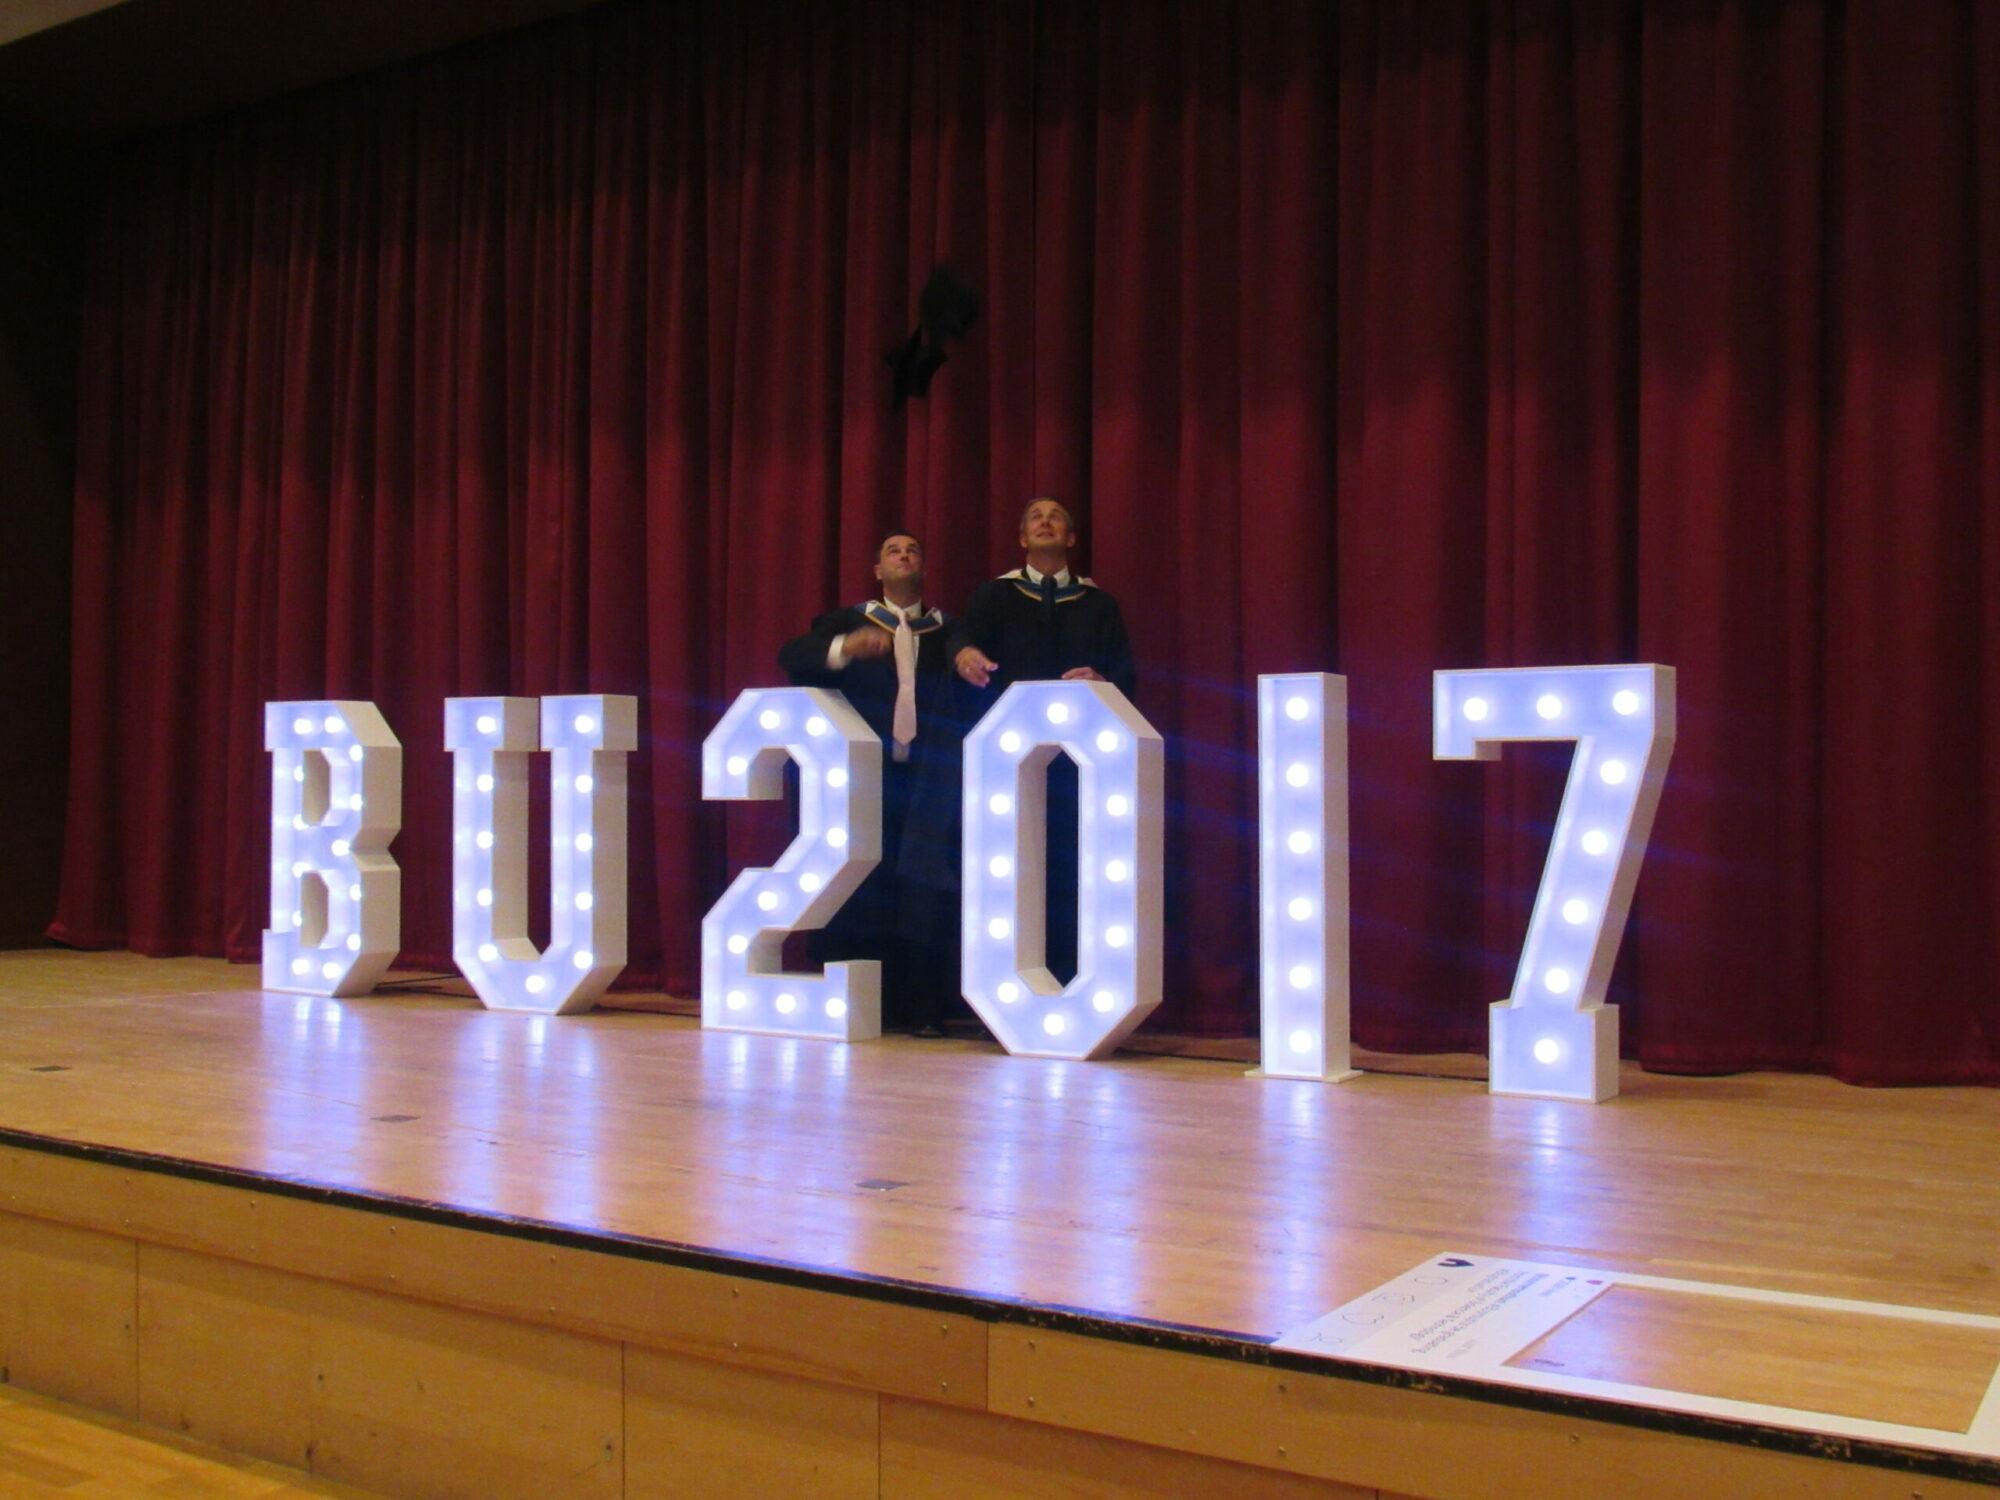 TDSi's Ian Hoare Gains Master's Degree from Bournemouth University